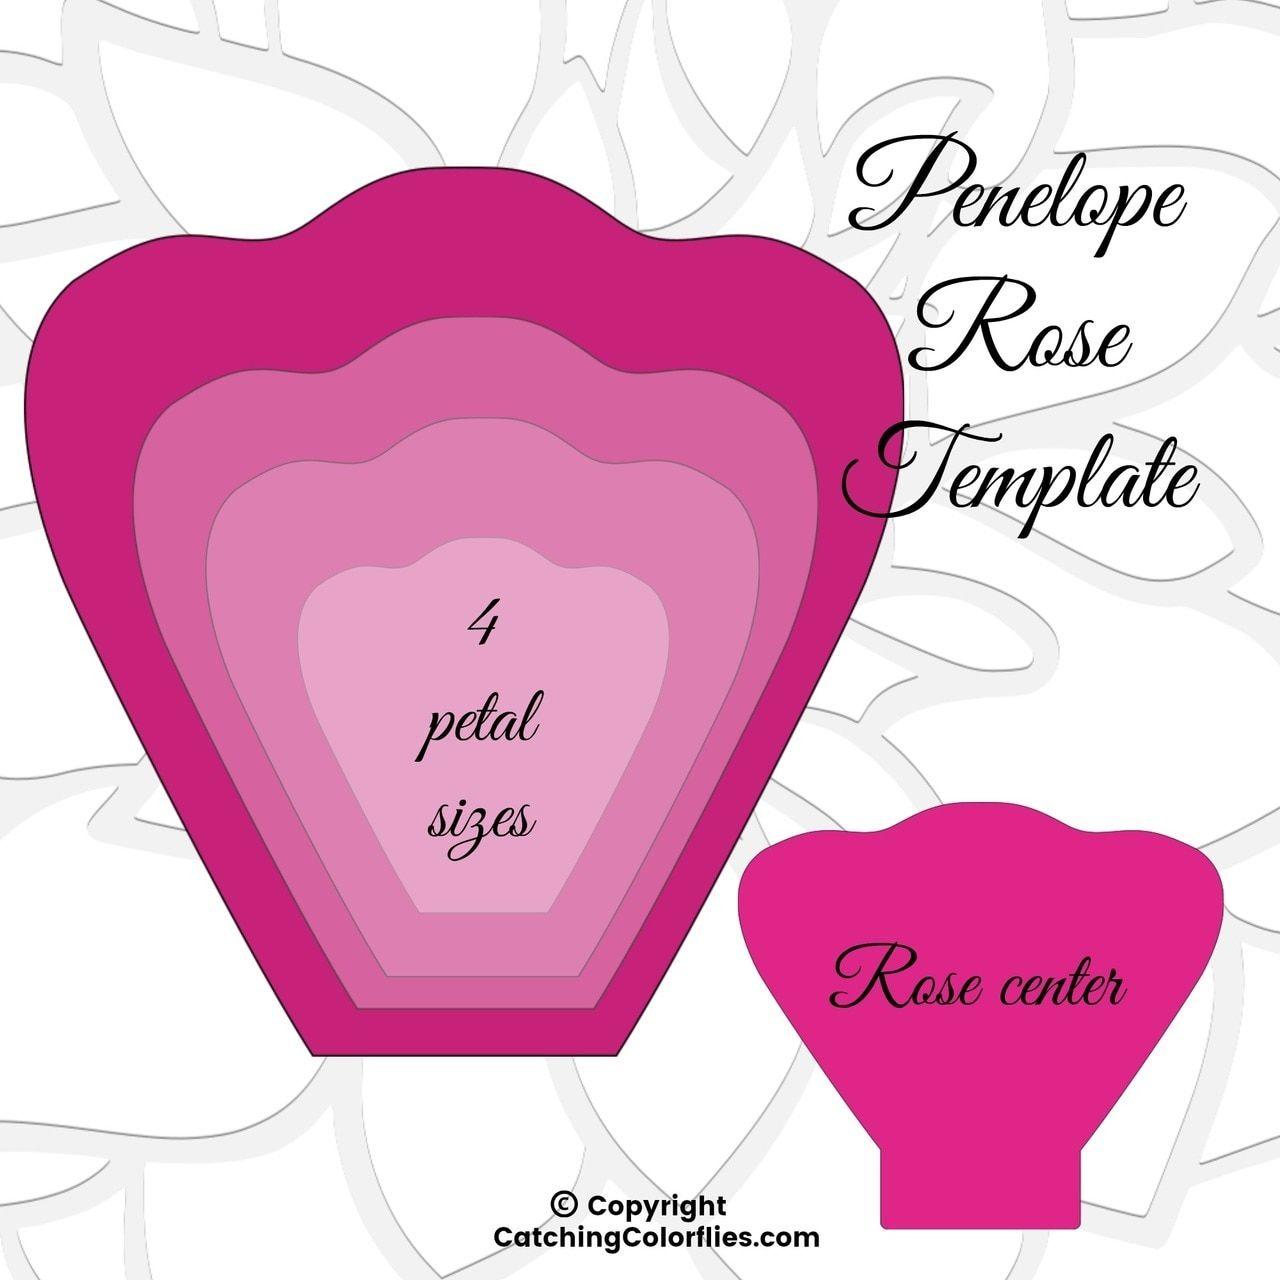 Penelope Paper Rose Template Diy Paper Rose Patterns Large